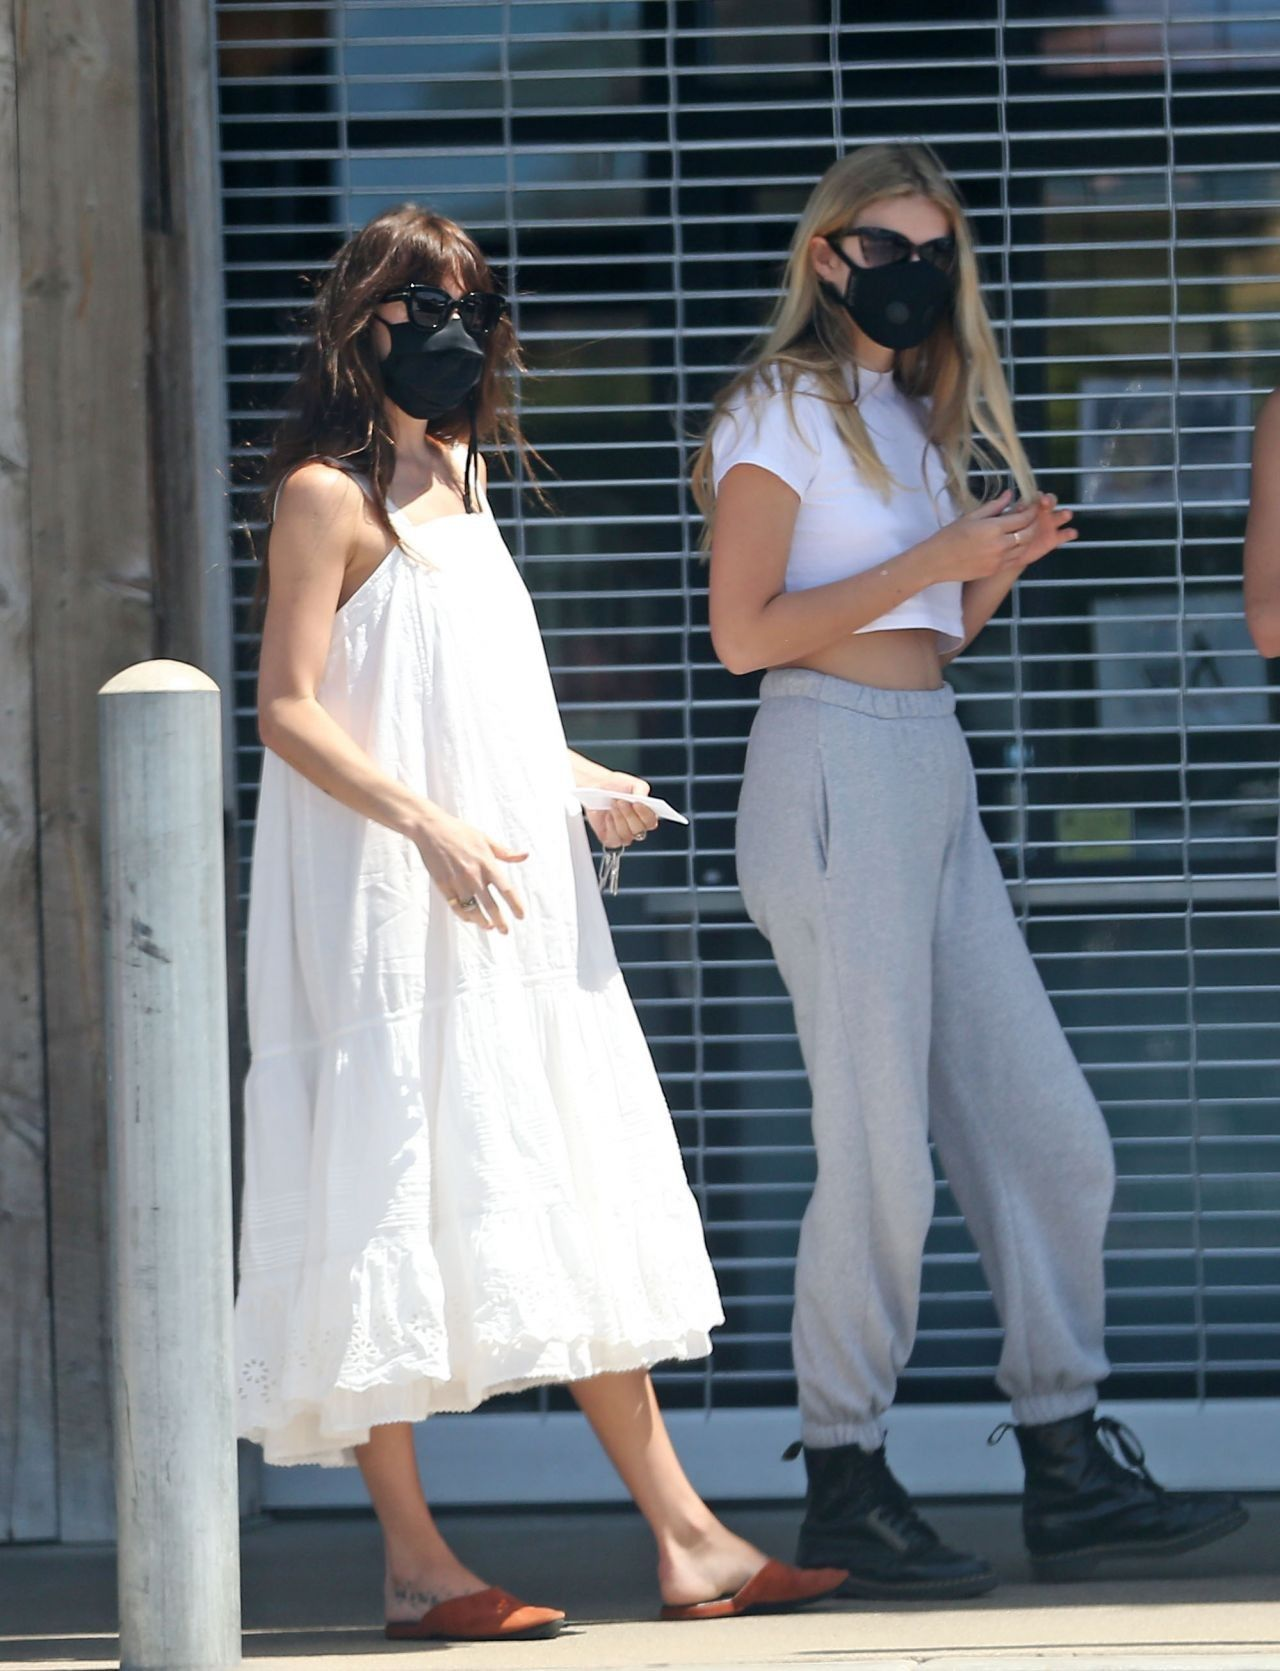 Dakota Johnson Ride With Chris Martin S Daughter Apple In Malibu 05 02 2020 In 2020 Street Style Dress Summer Street Style Dress Midi Dress Summer